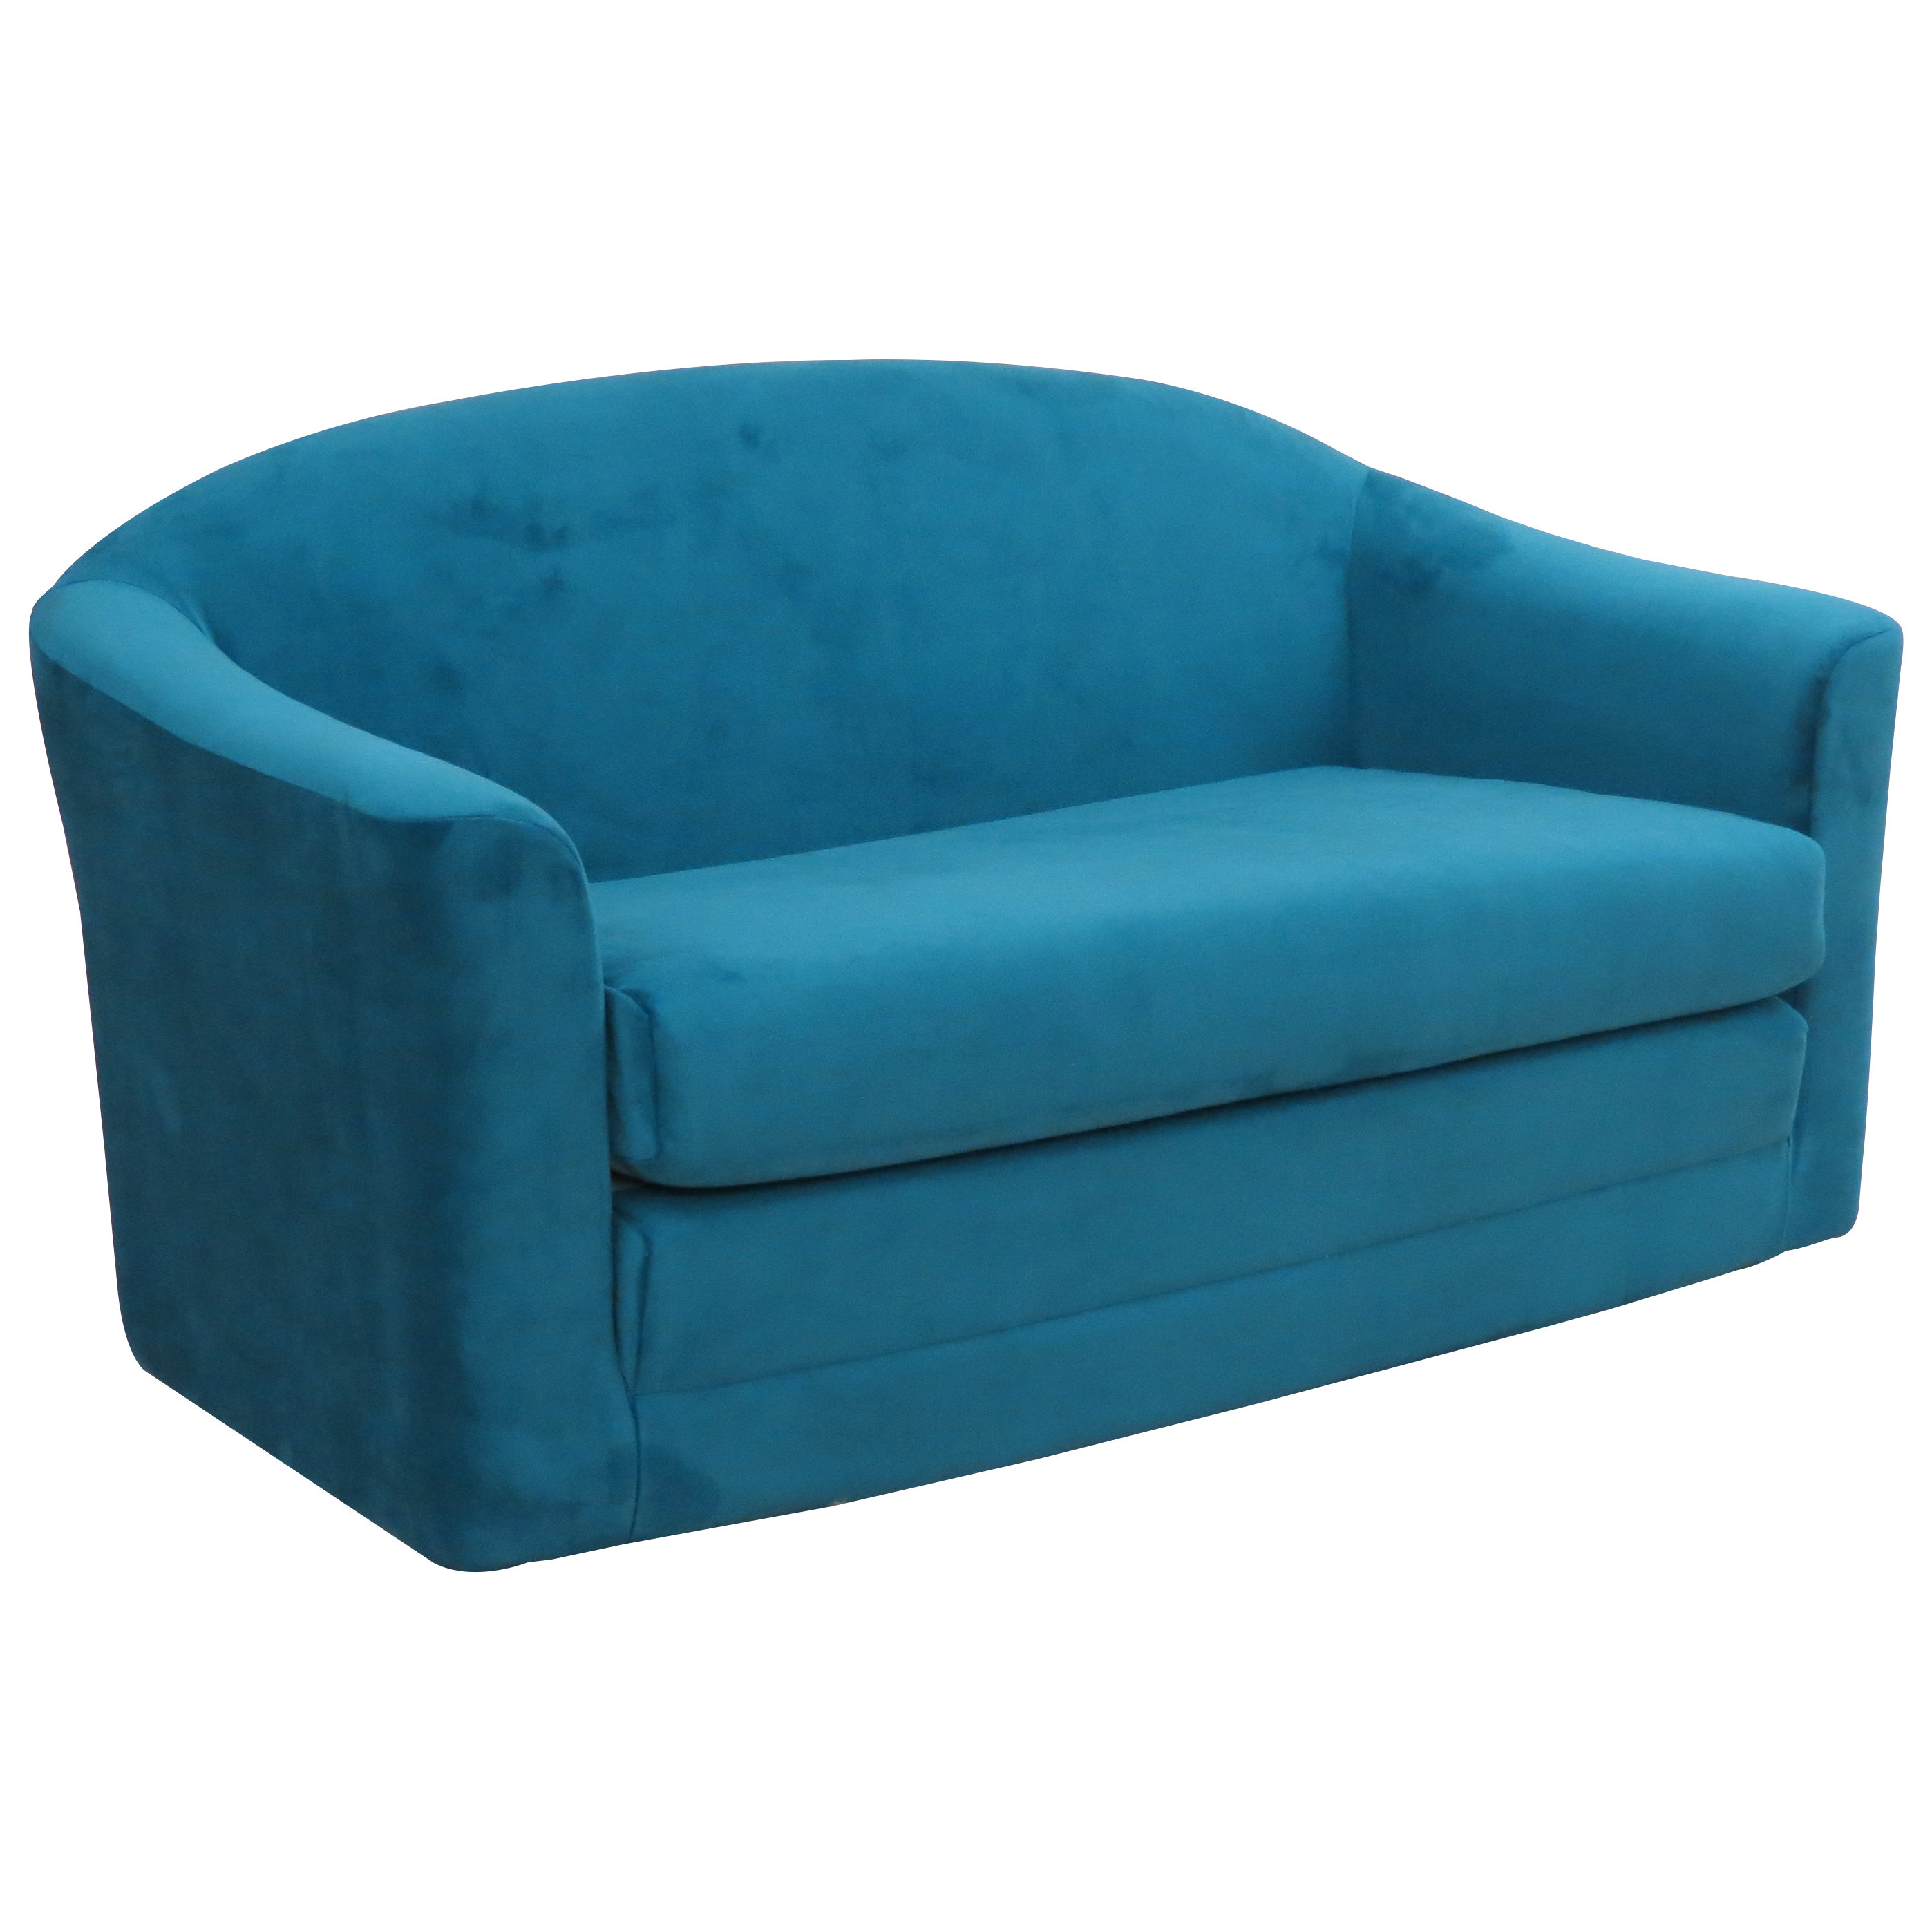 Fox Hill Trading Children's Sofa Bed & Reviews    Wayfair DWNSCAD